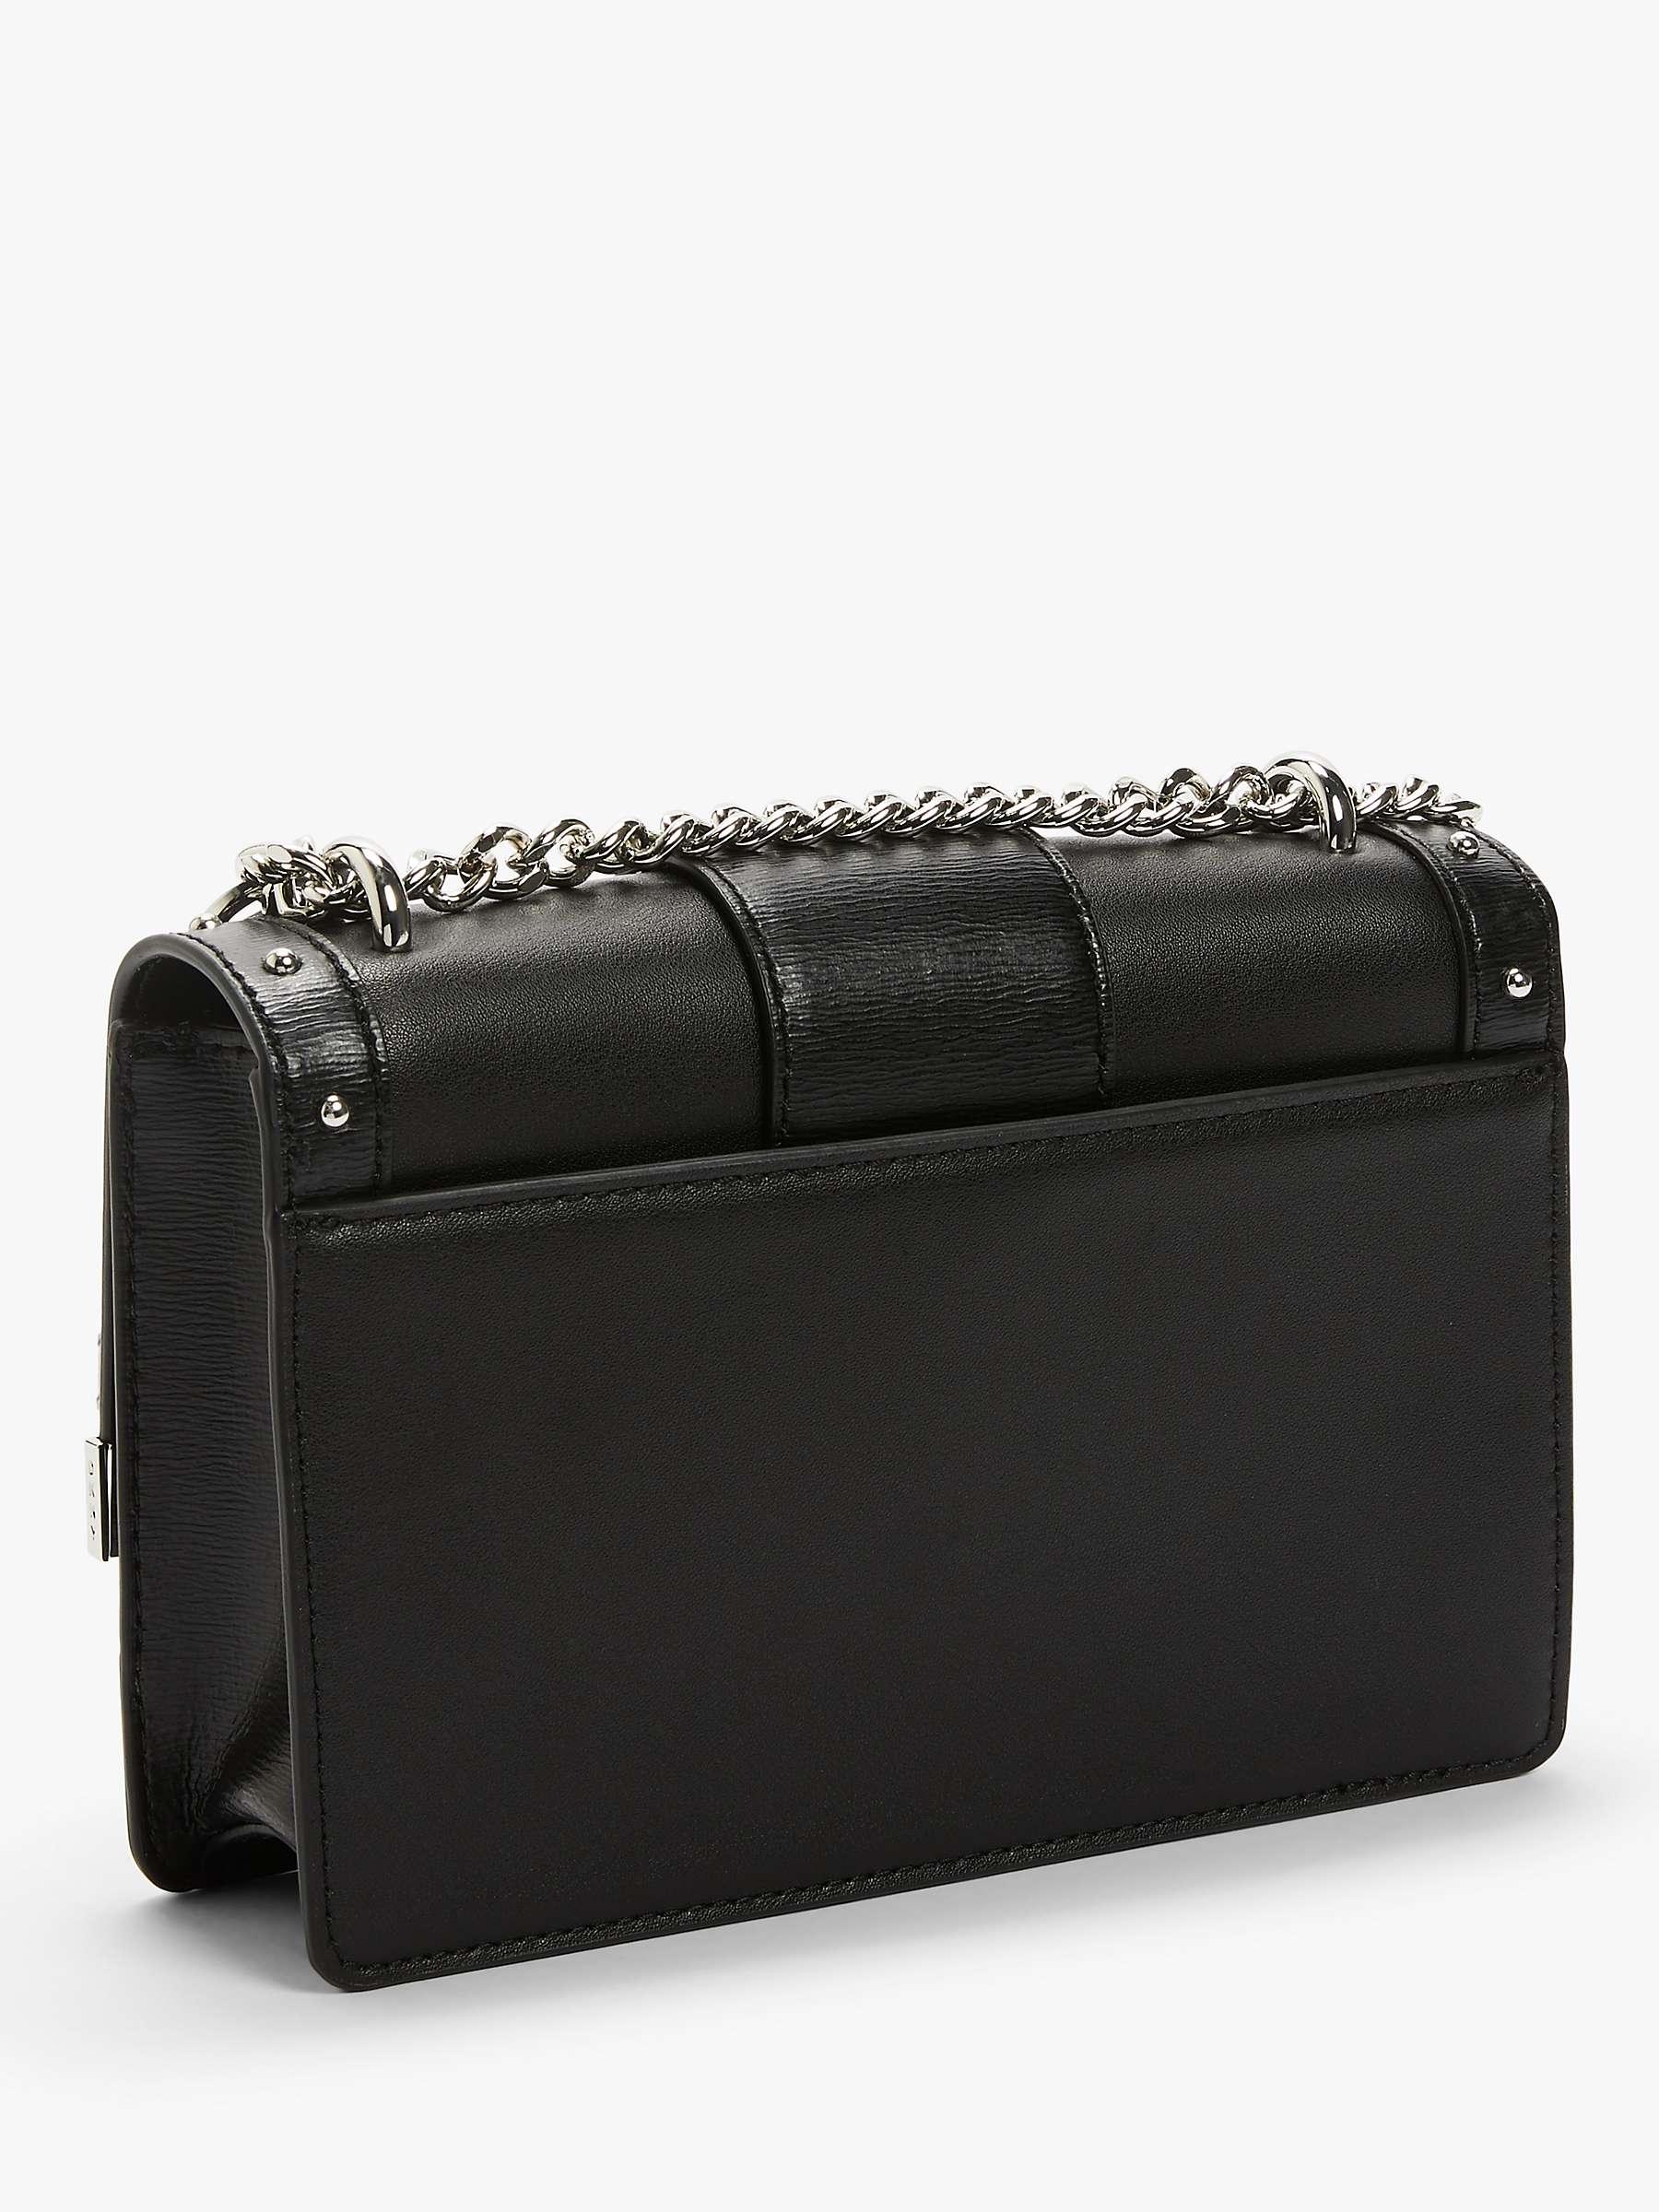 DKNY Dayna Small Leather Shoulder Bag, BlackSilver